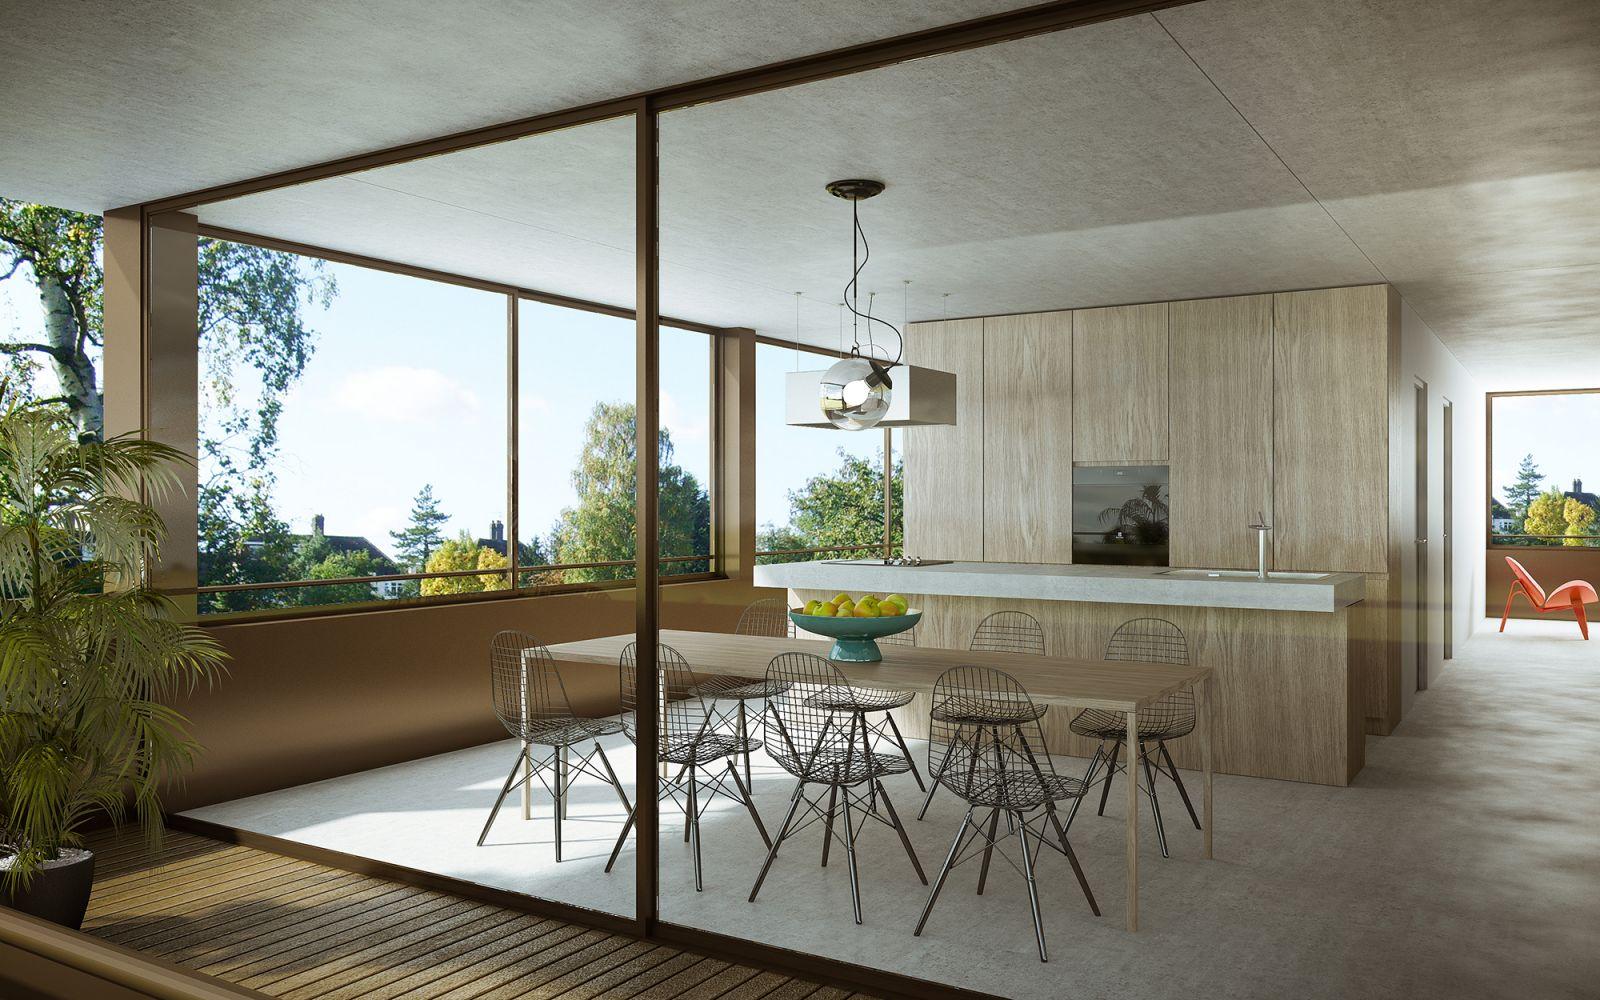 Le Vallon de Villars - Apartments 243